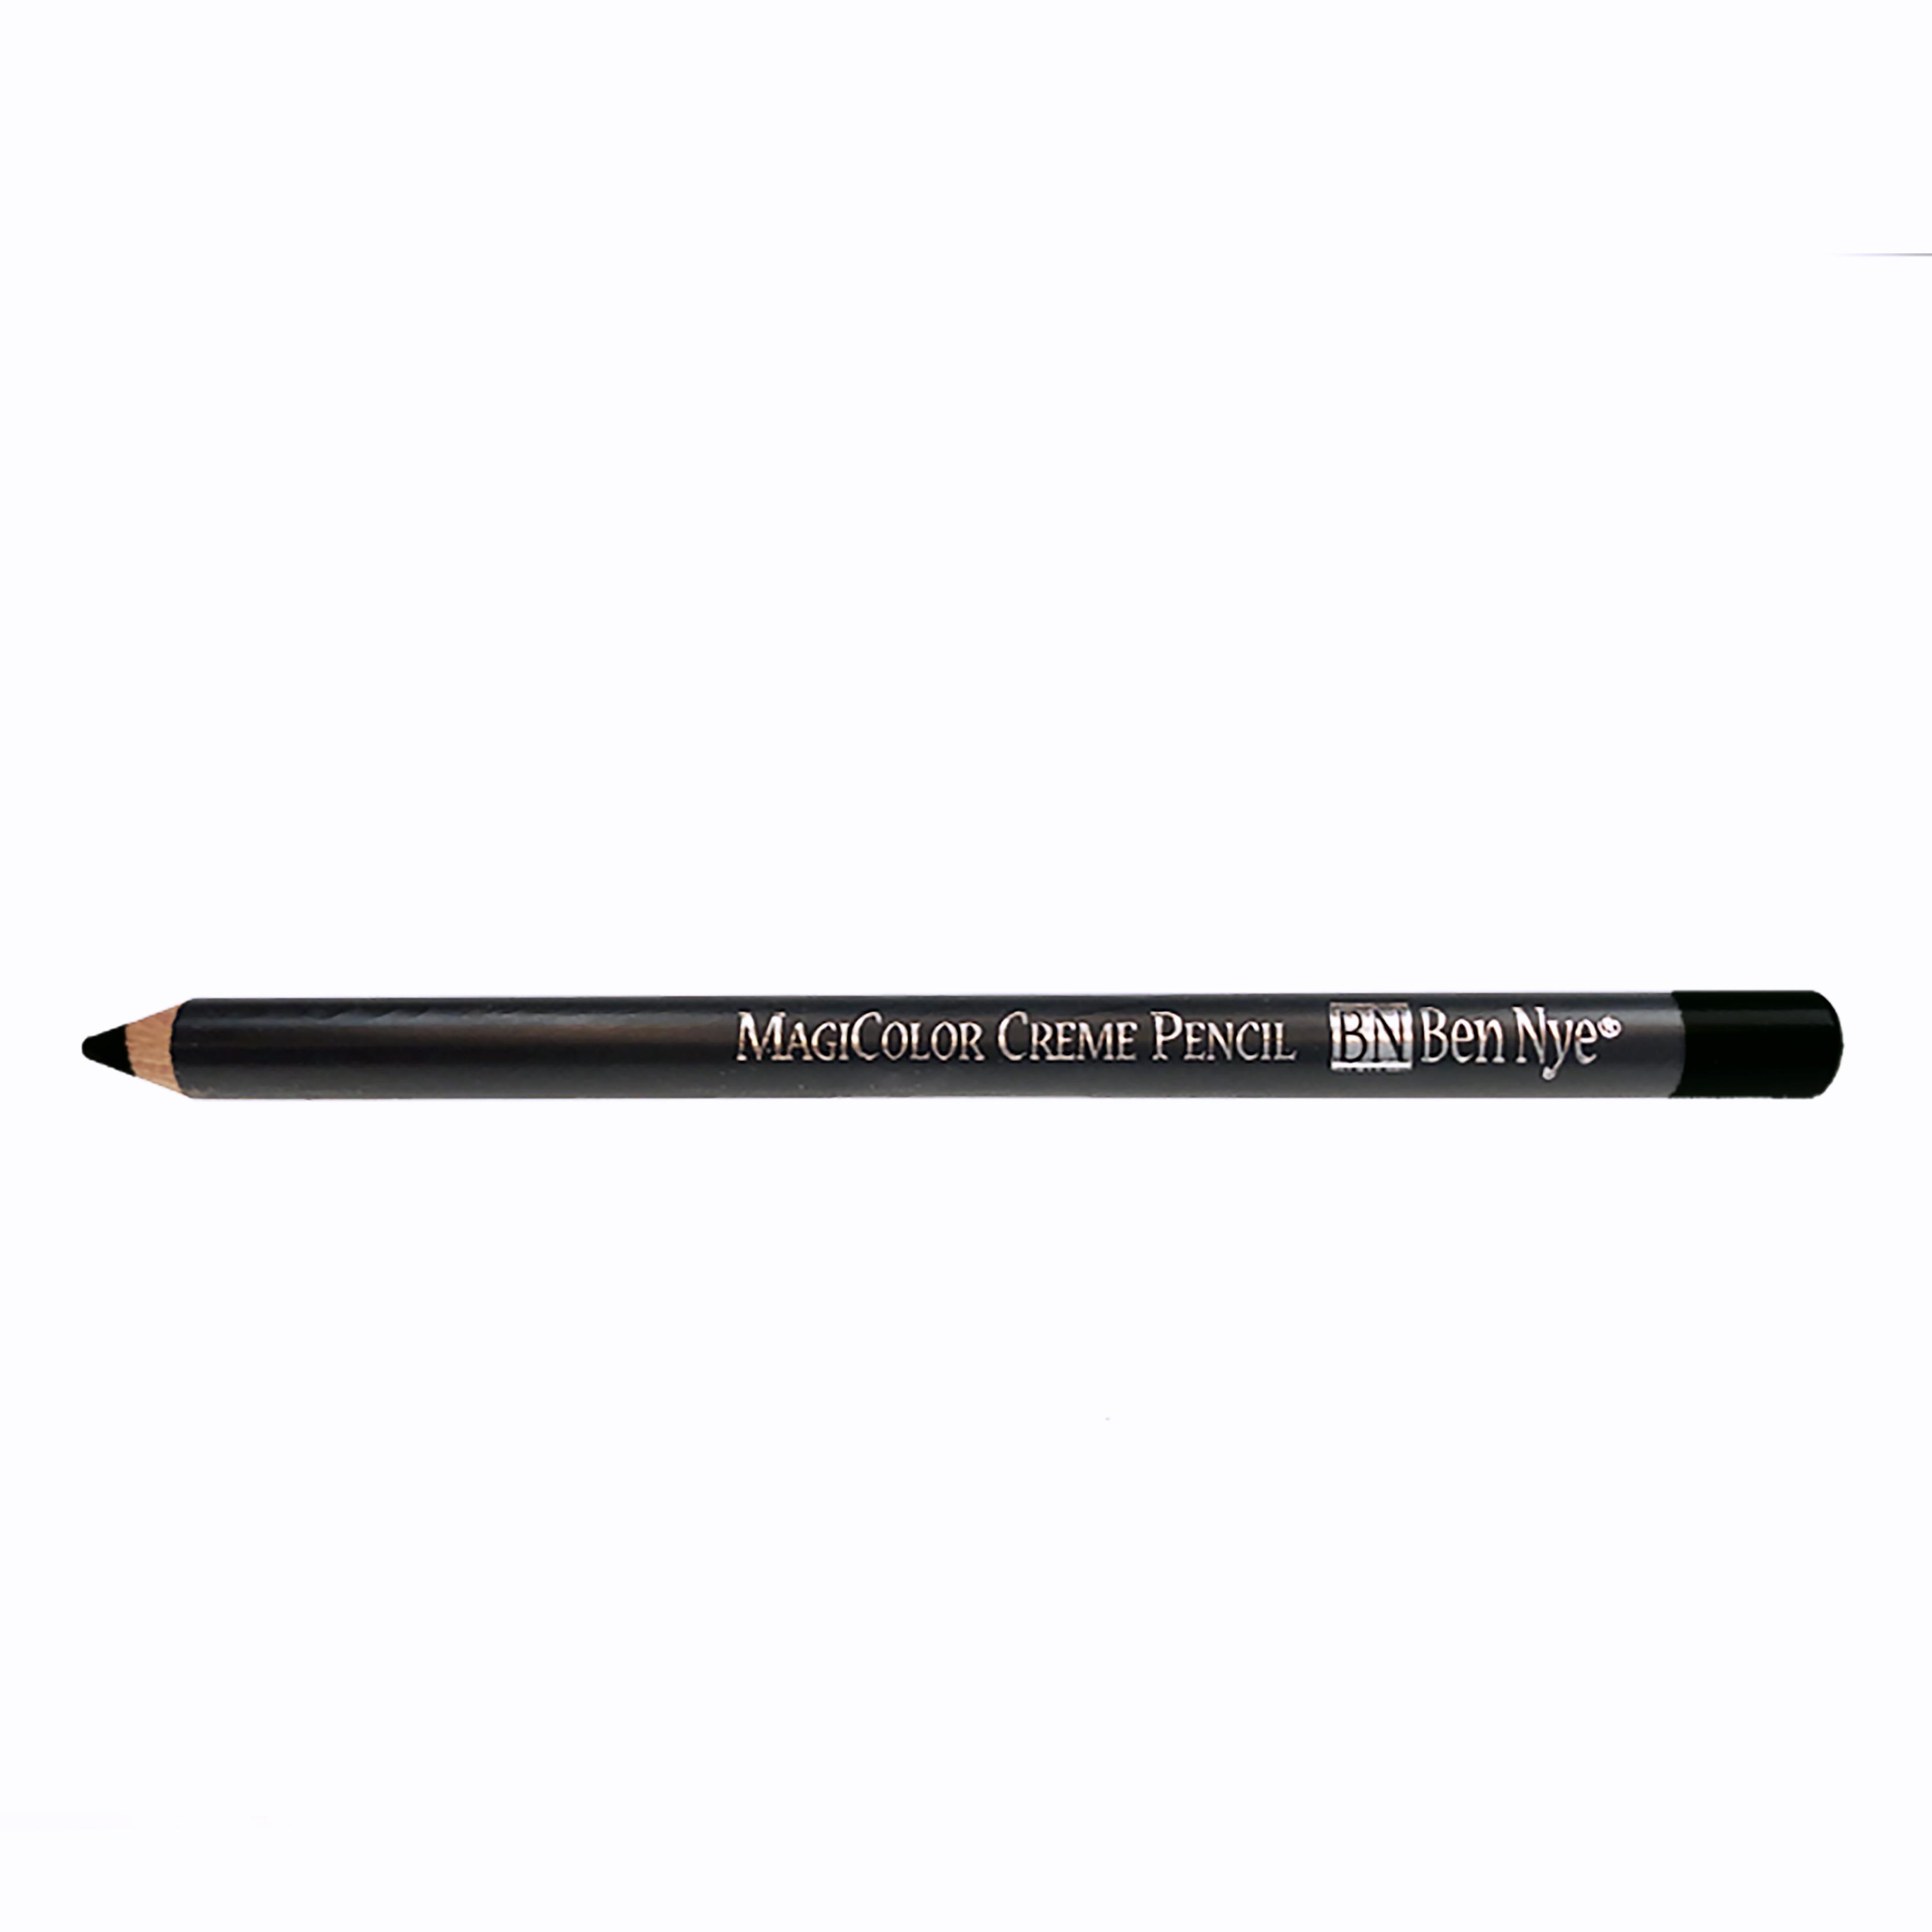 Magicolor Creme Pencils - Black